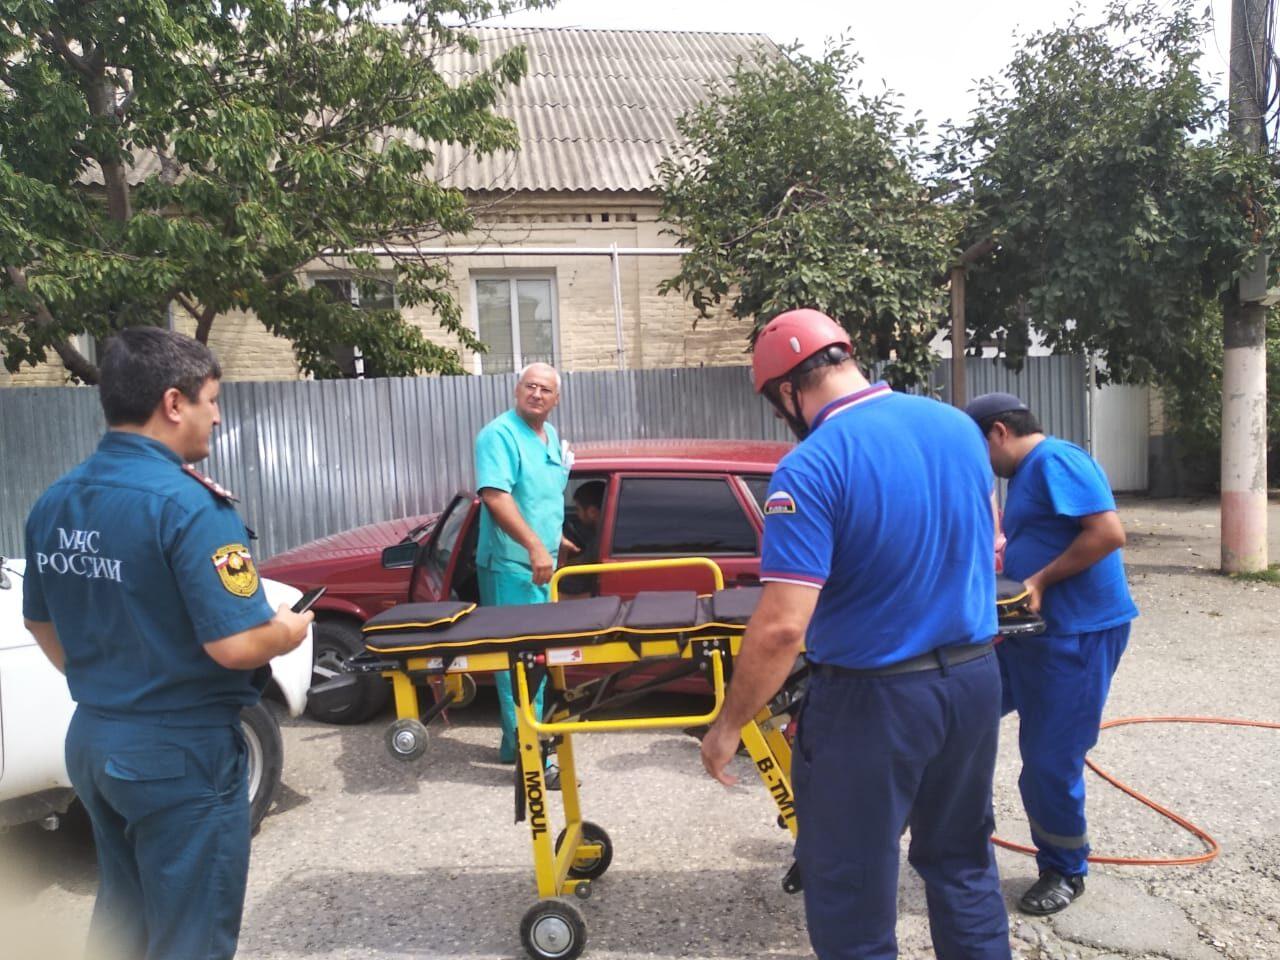 Хасавюртовские спасатели успешно отработали действия на учениях по ликвидации ДТП.